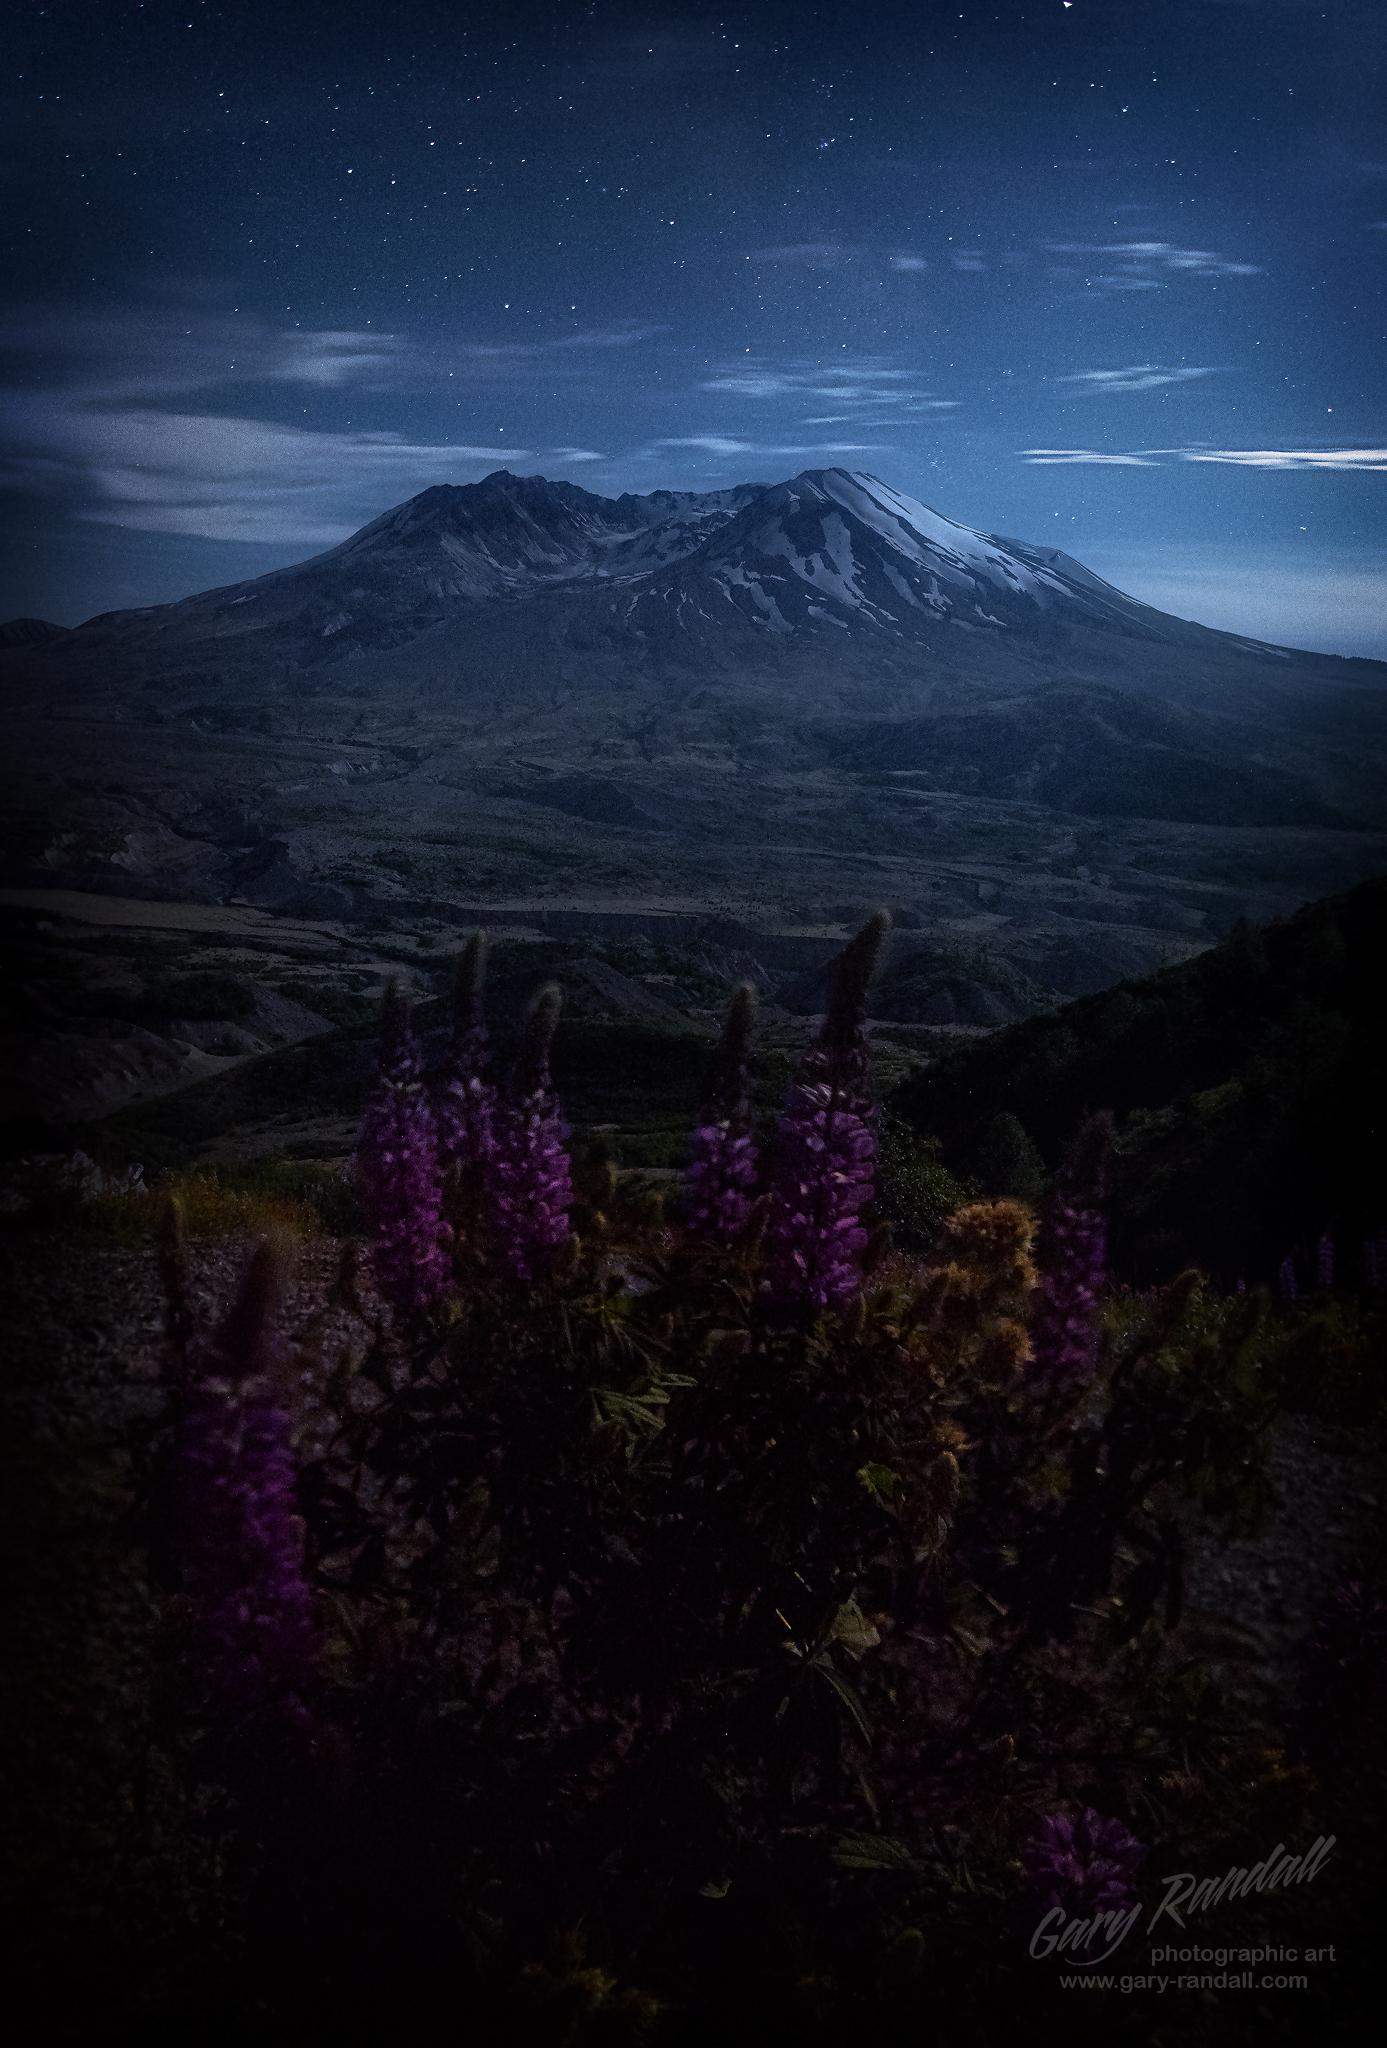 Moonlit Mount St Helens